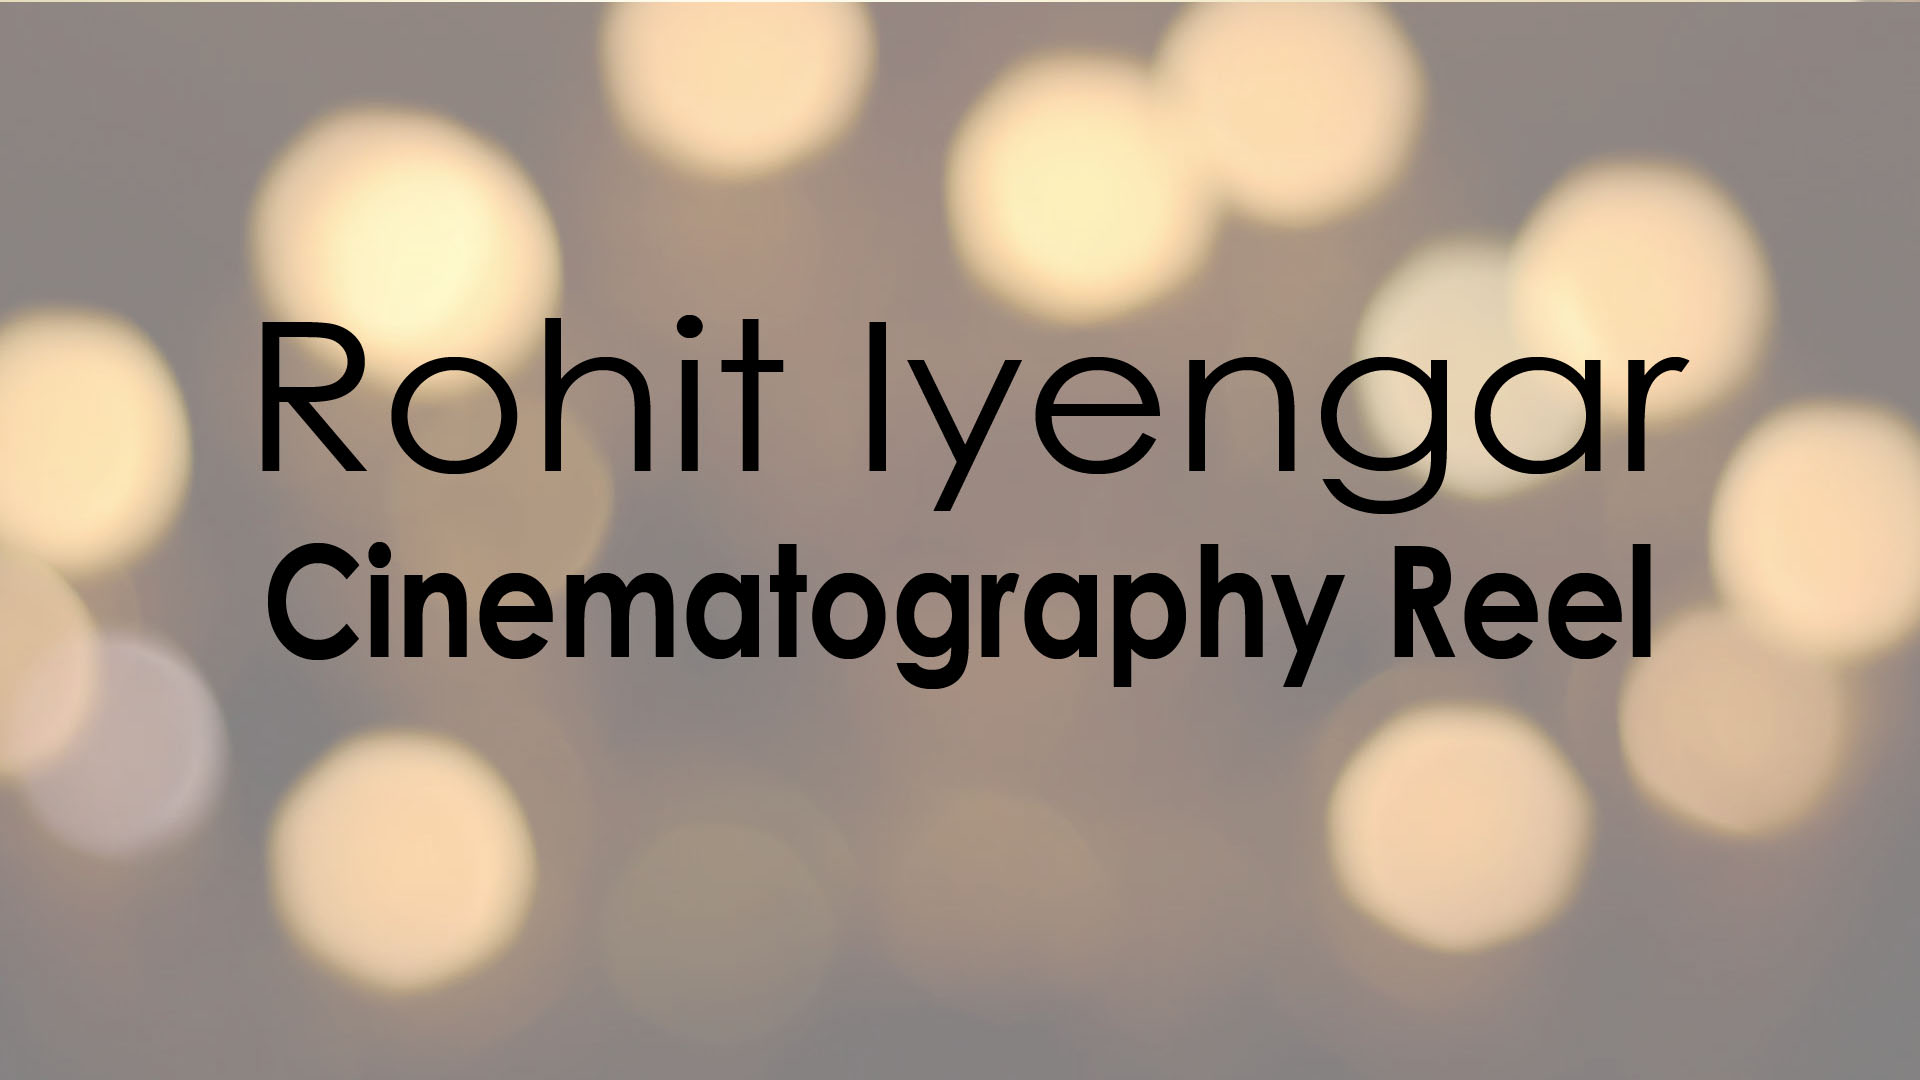 Cinematography Reel.jpg